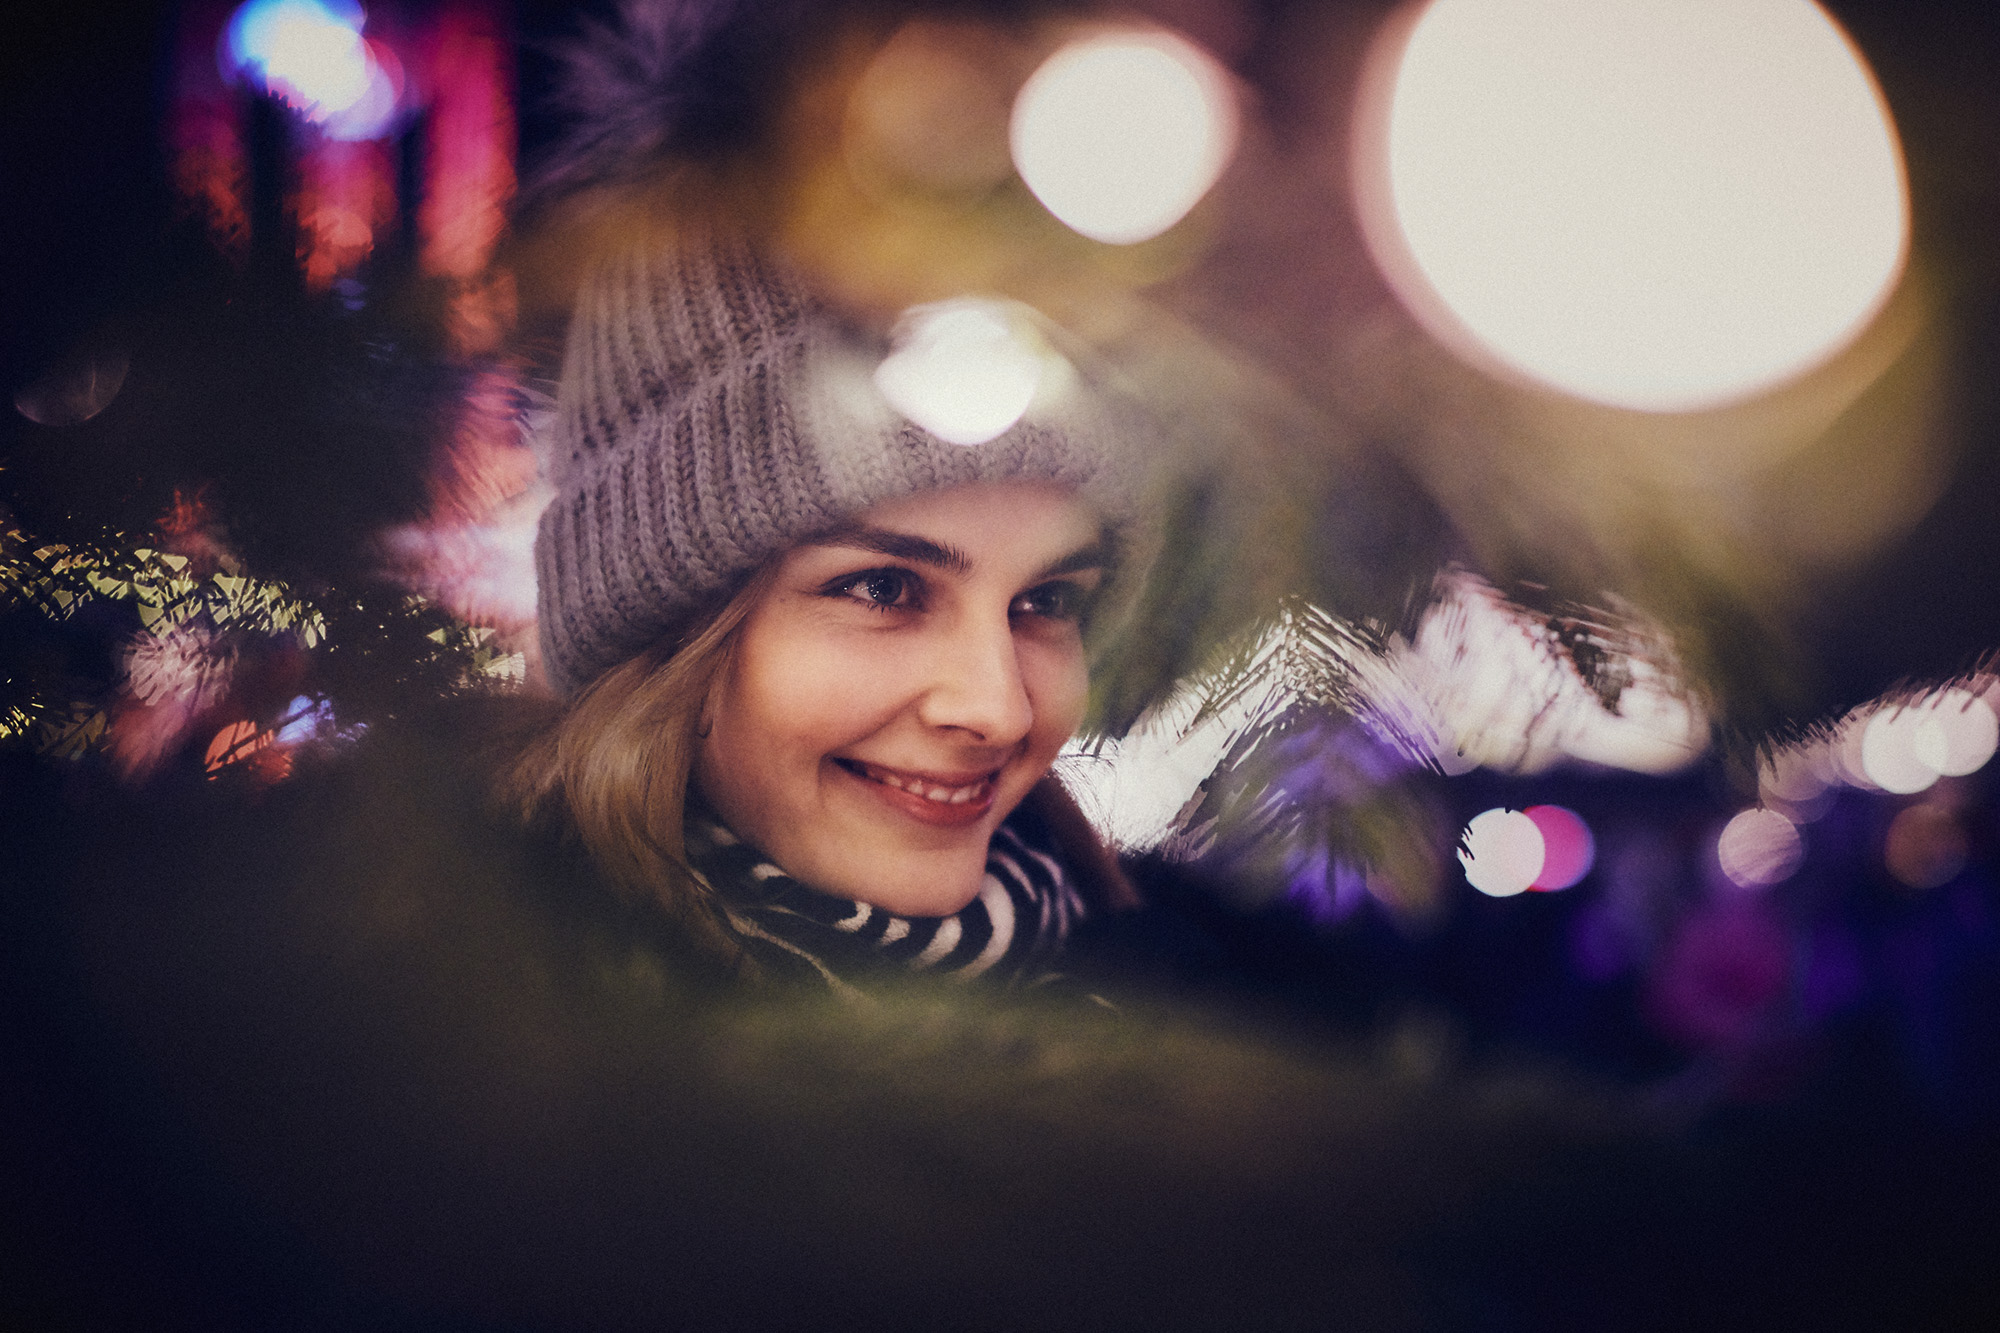 winter lifestyle photography christmas lights